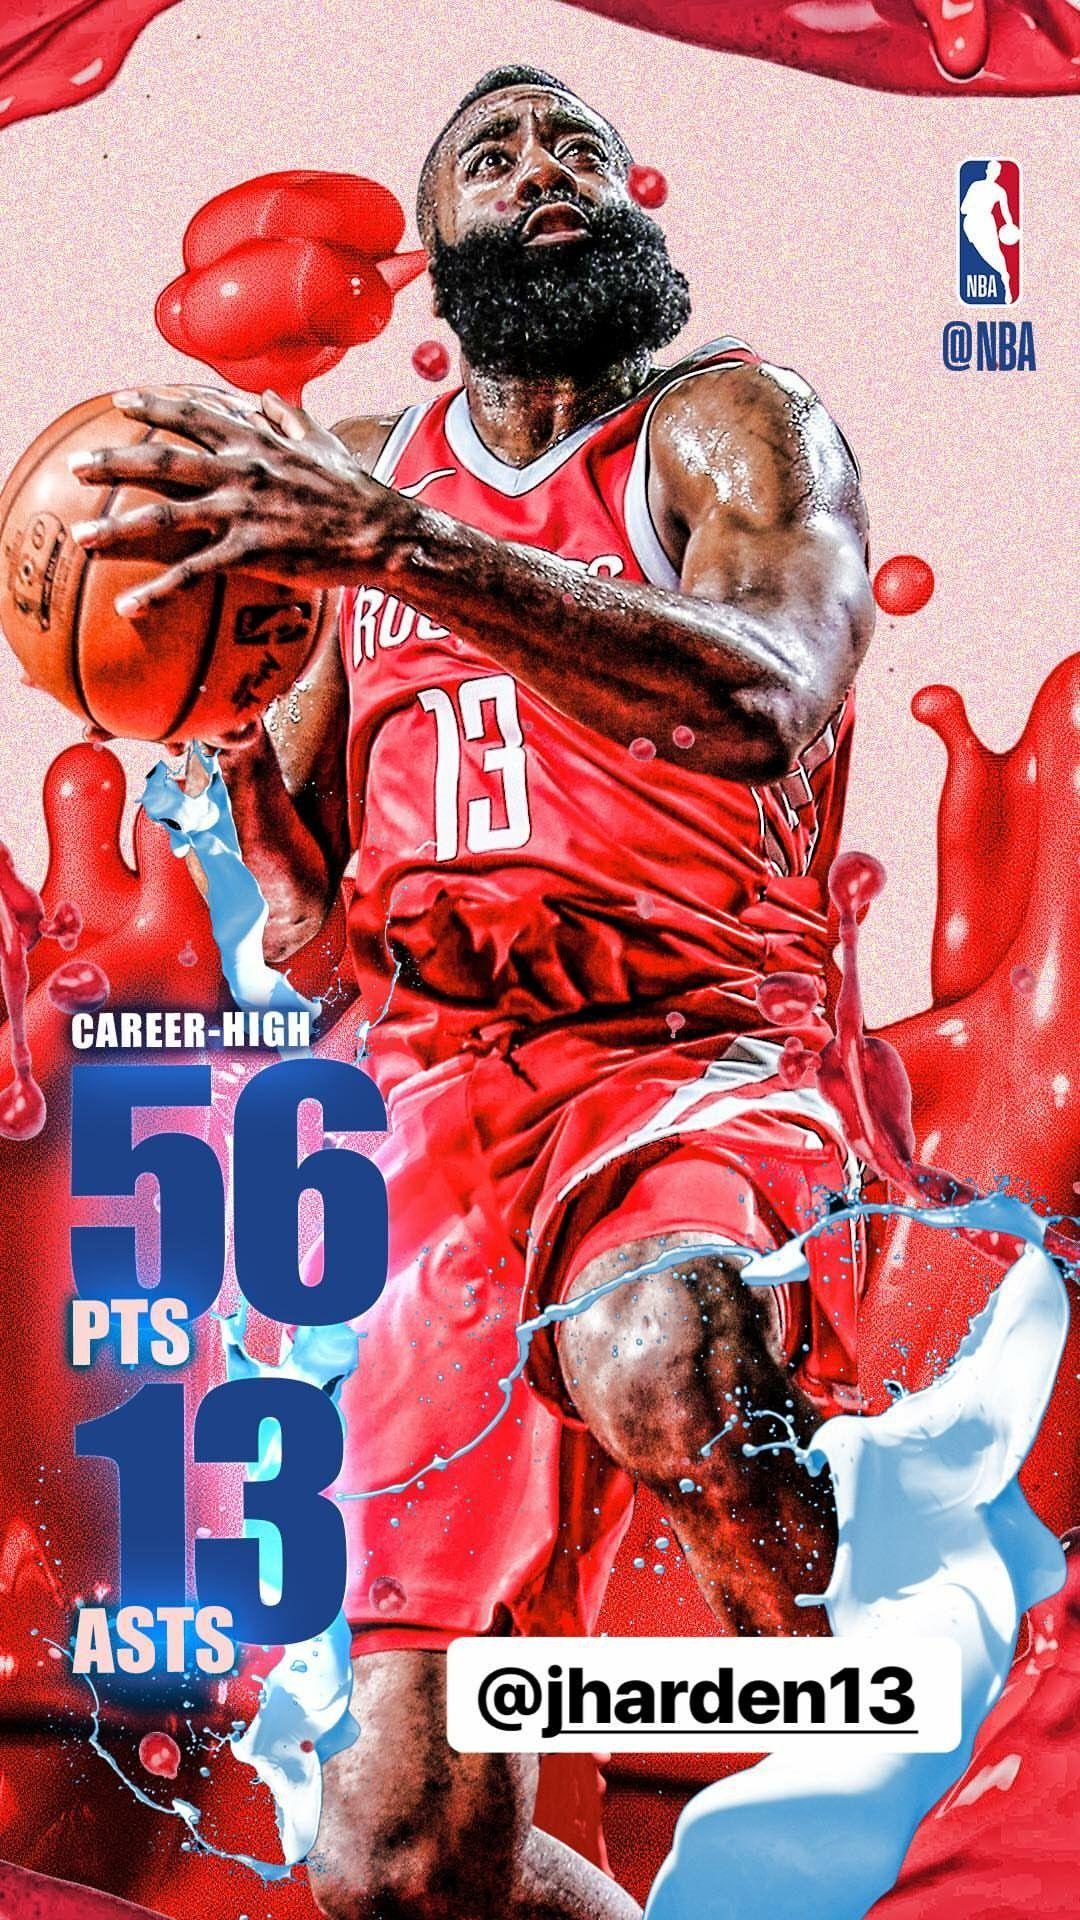 James harden career high nba sports nba nba basketball